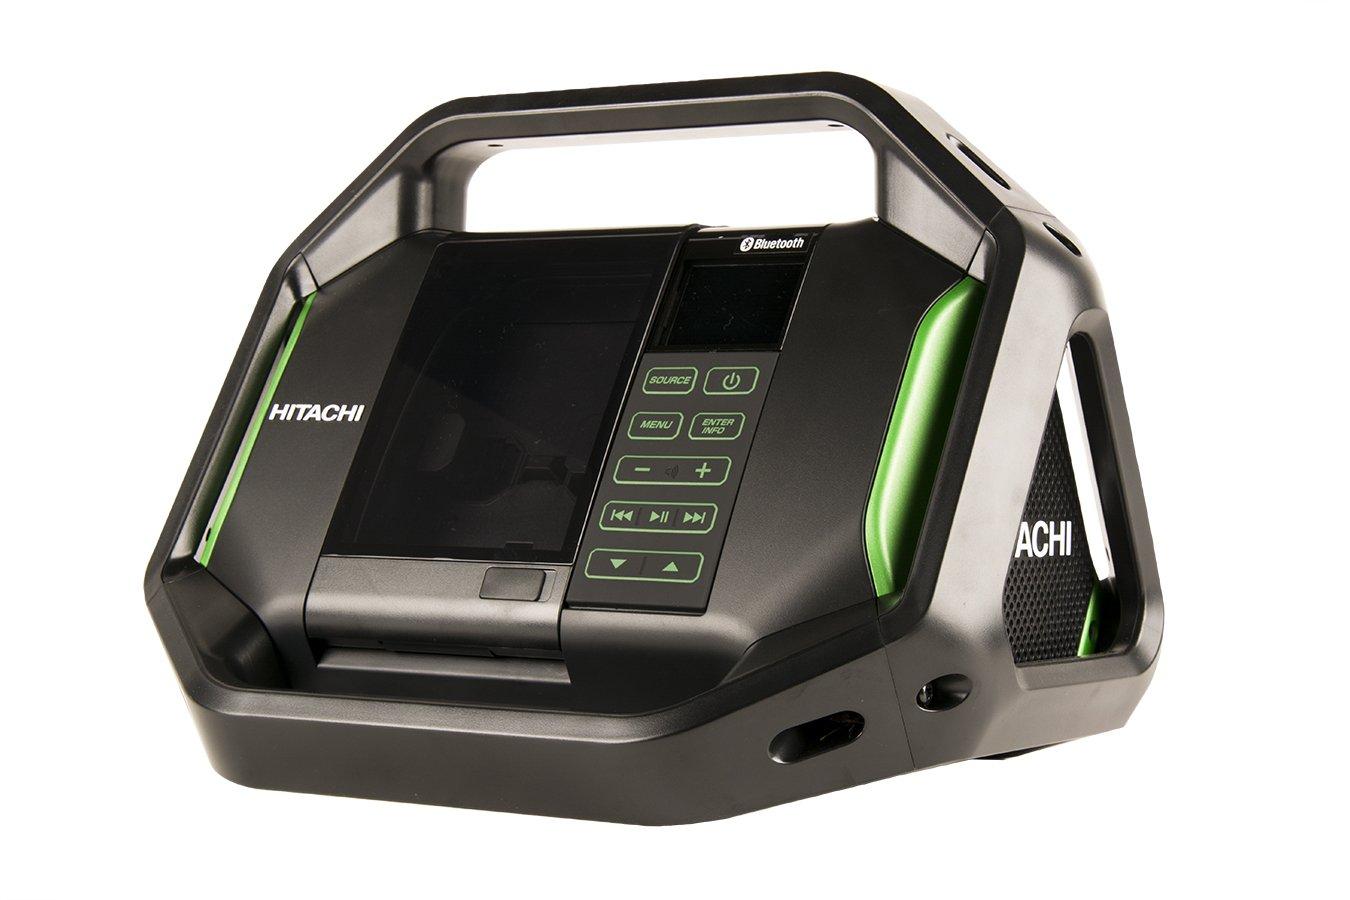 hitachi work radio. hitachi ur18dsalp4 cordless 18-volt lithium-ion bluetooth radio with usb charger and alarm (radio only, no battery) - amazon.com work